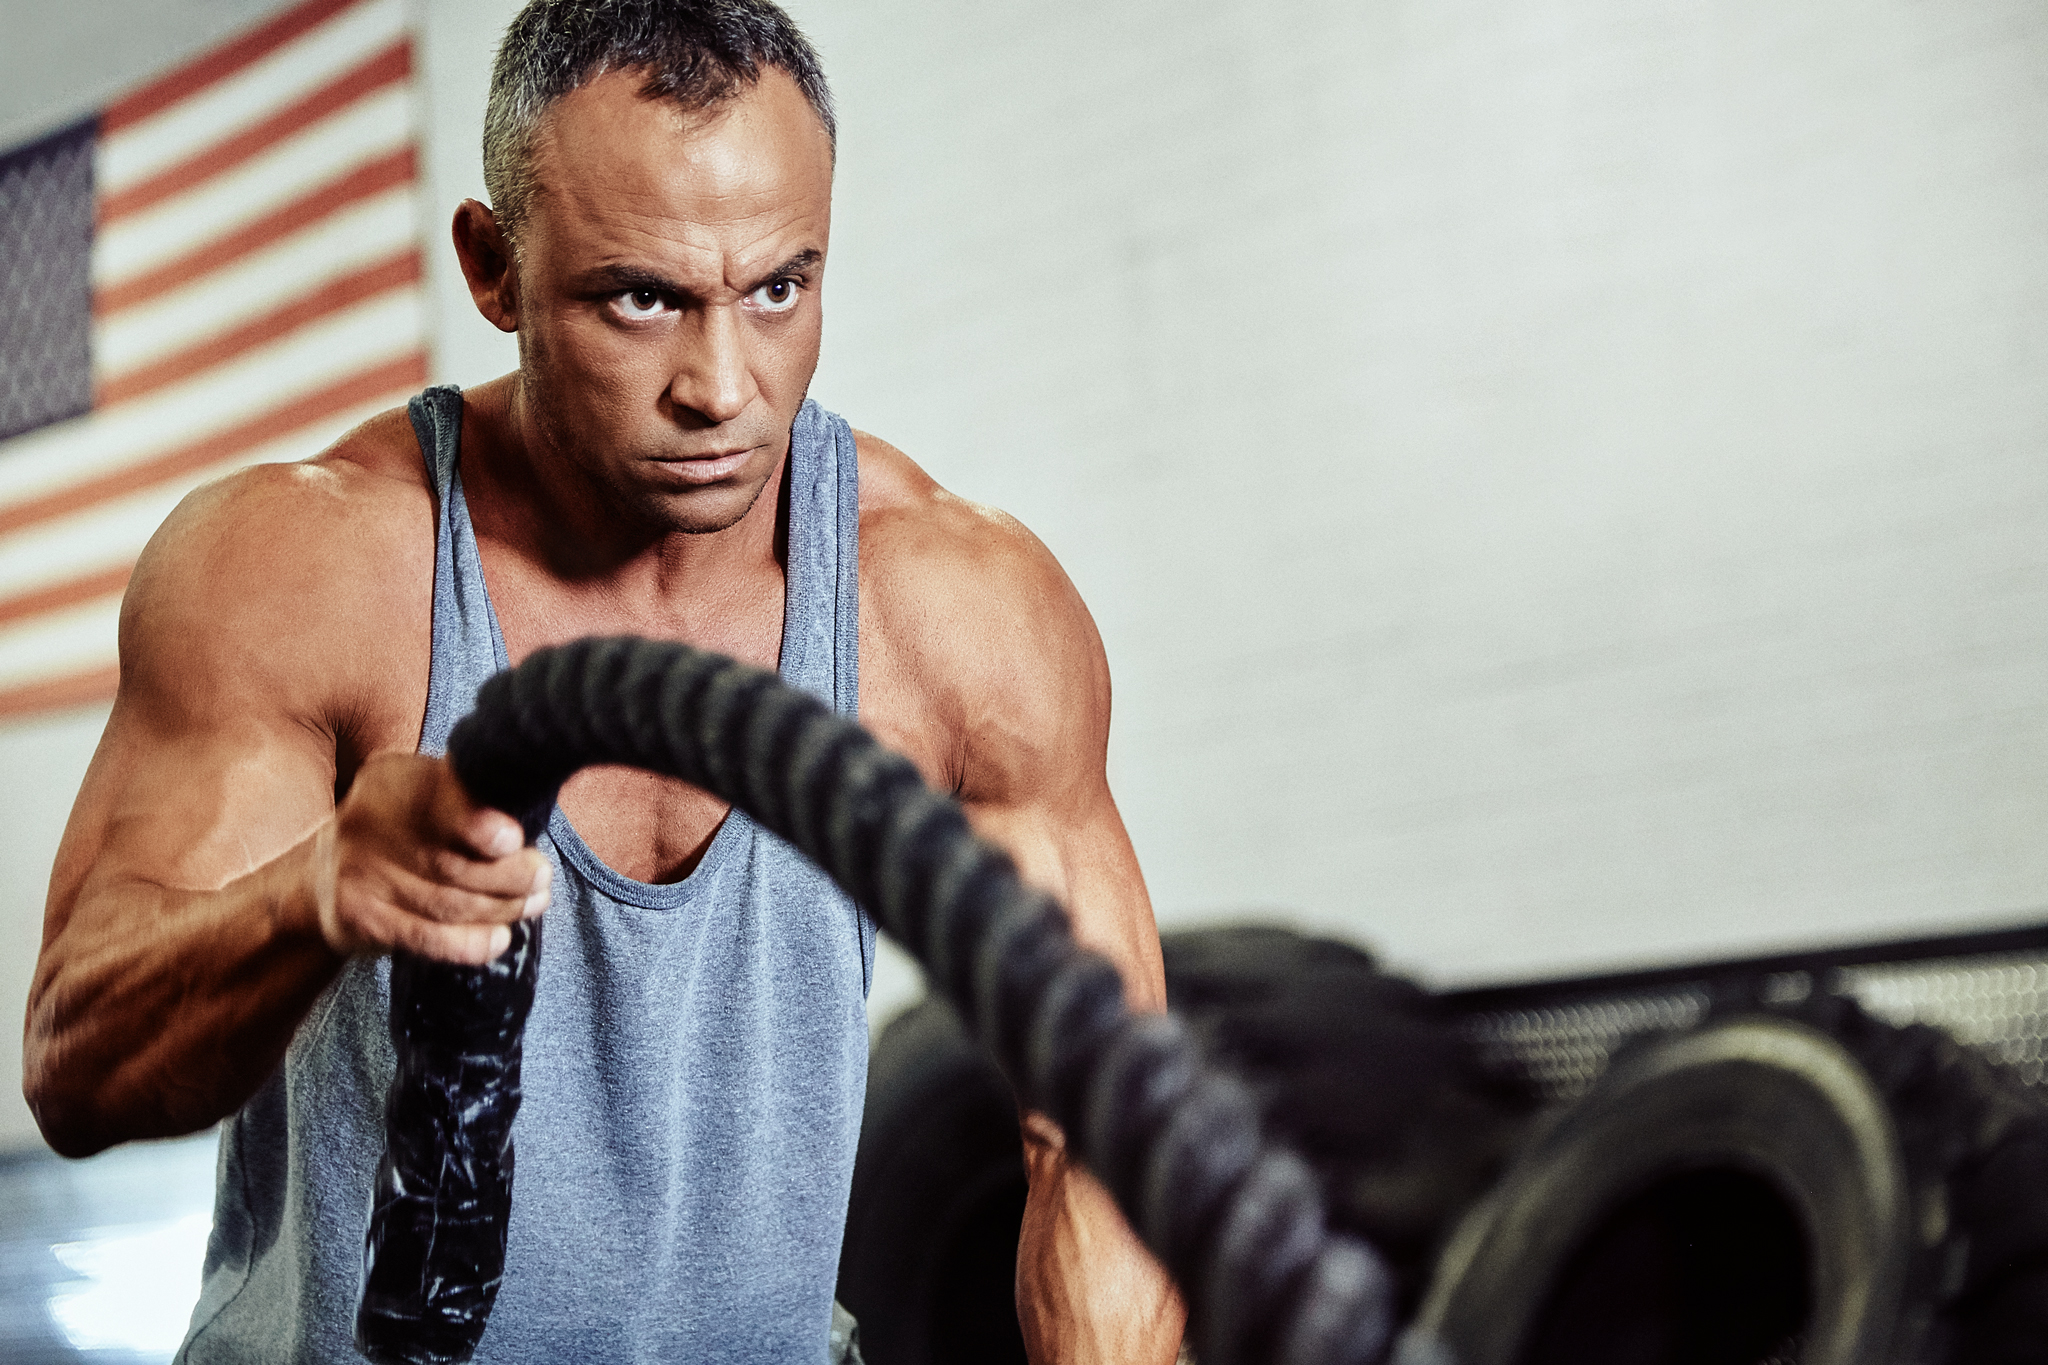 Phoenix Commercial Fitness Photographer